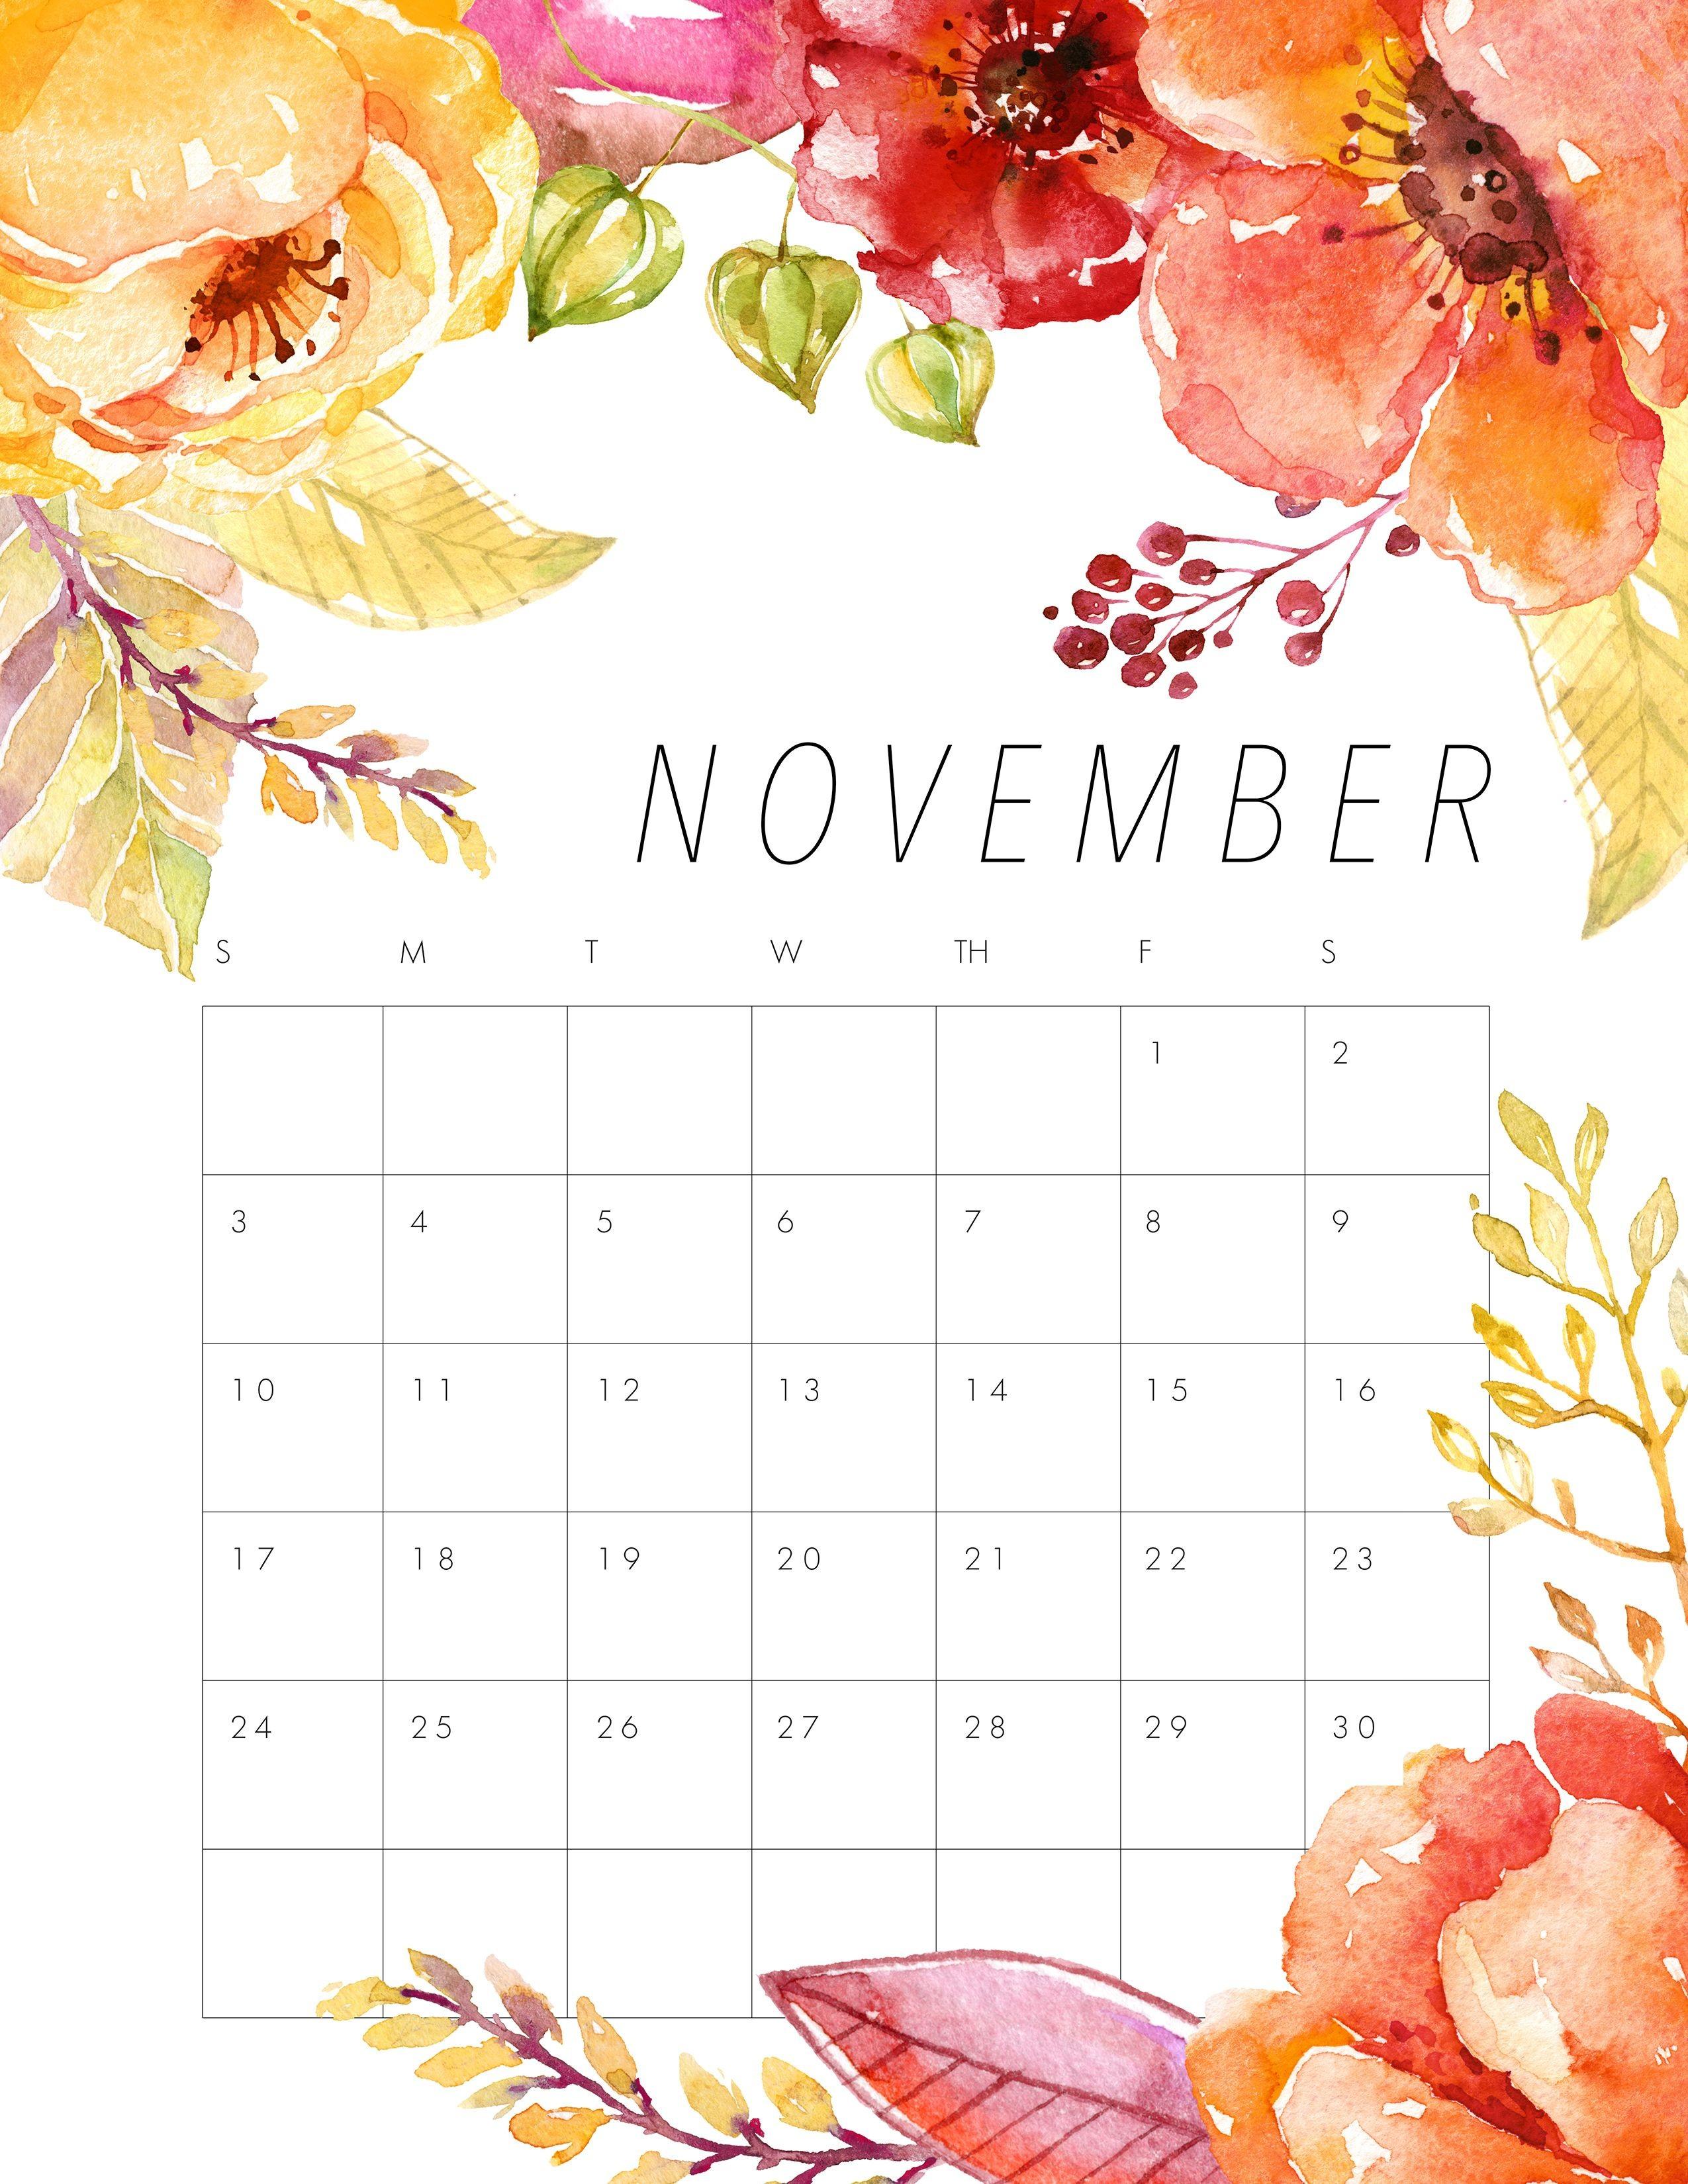 Calendario 2019 Y 2019 Más Recientemente Liberado Pin Od Použvateľa Iva Smatana Na Nástenke Planner 2019